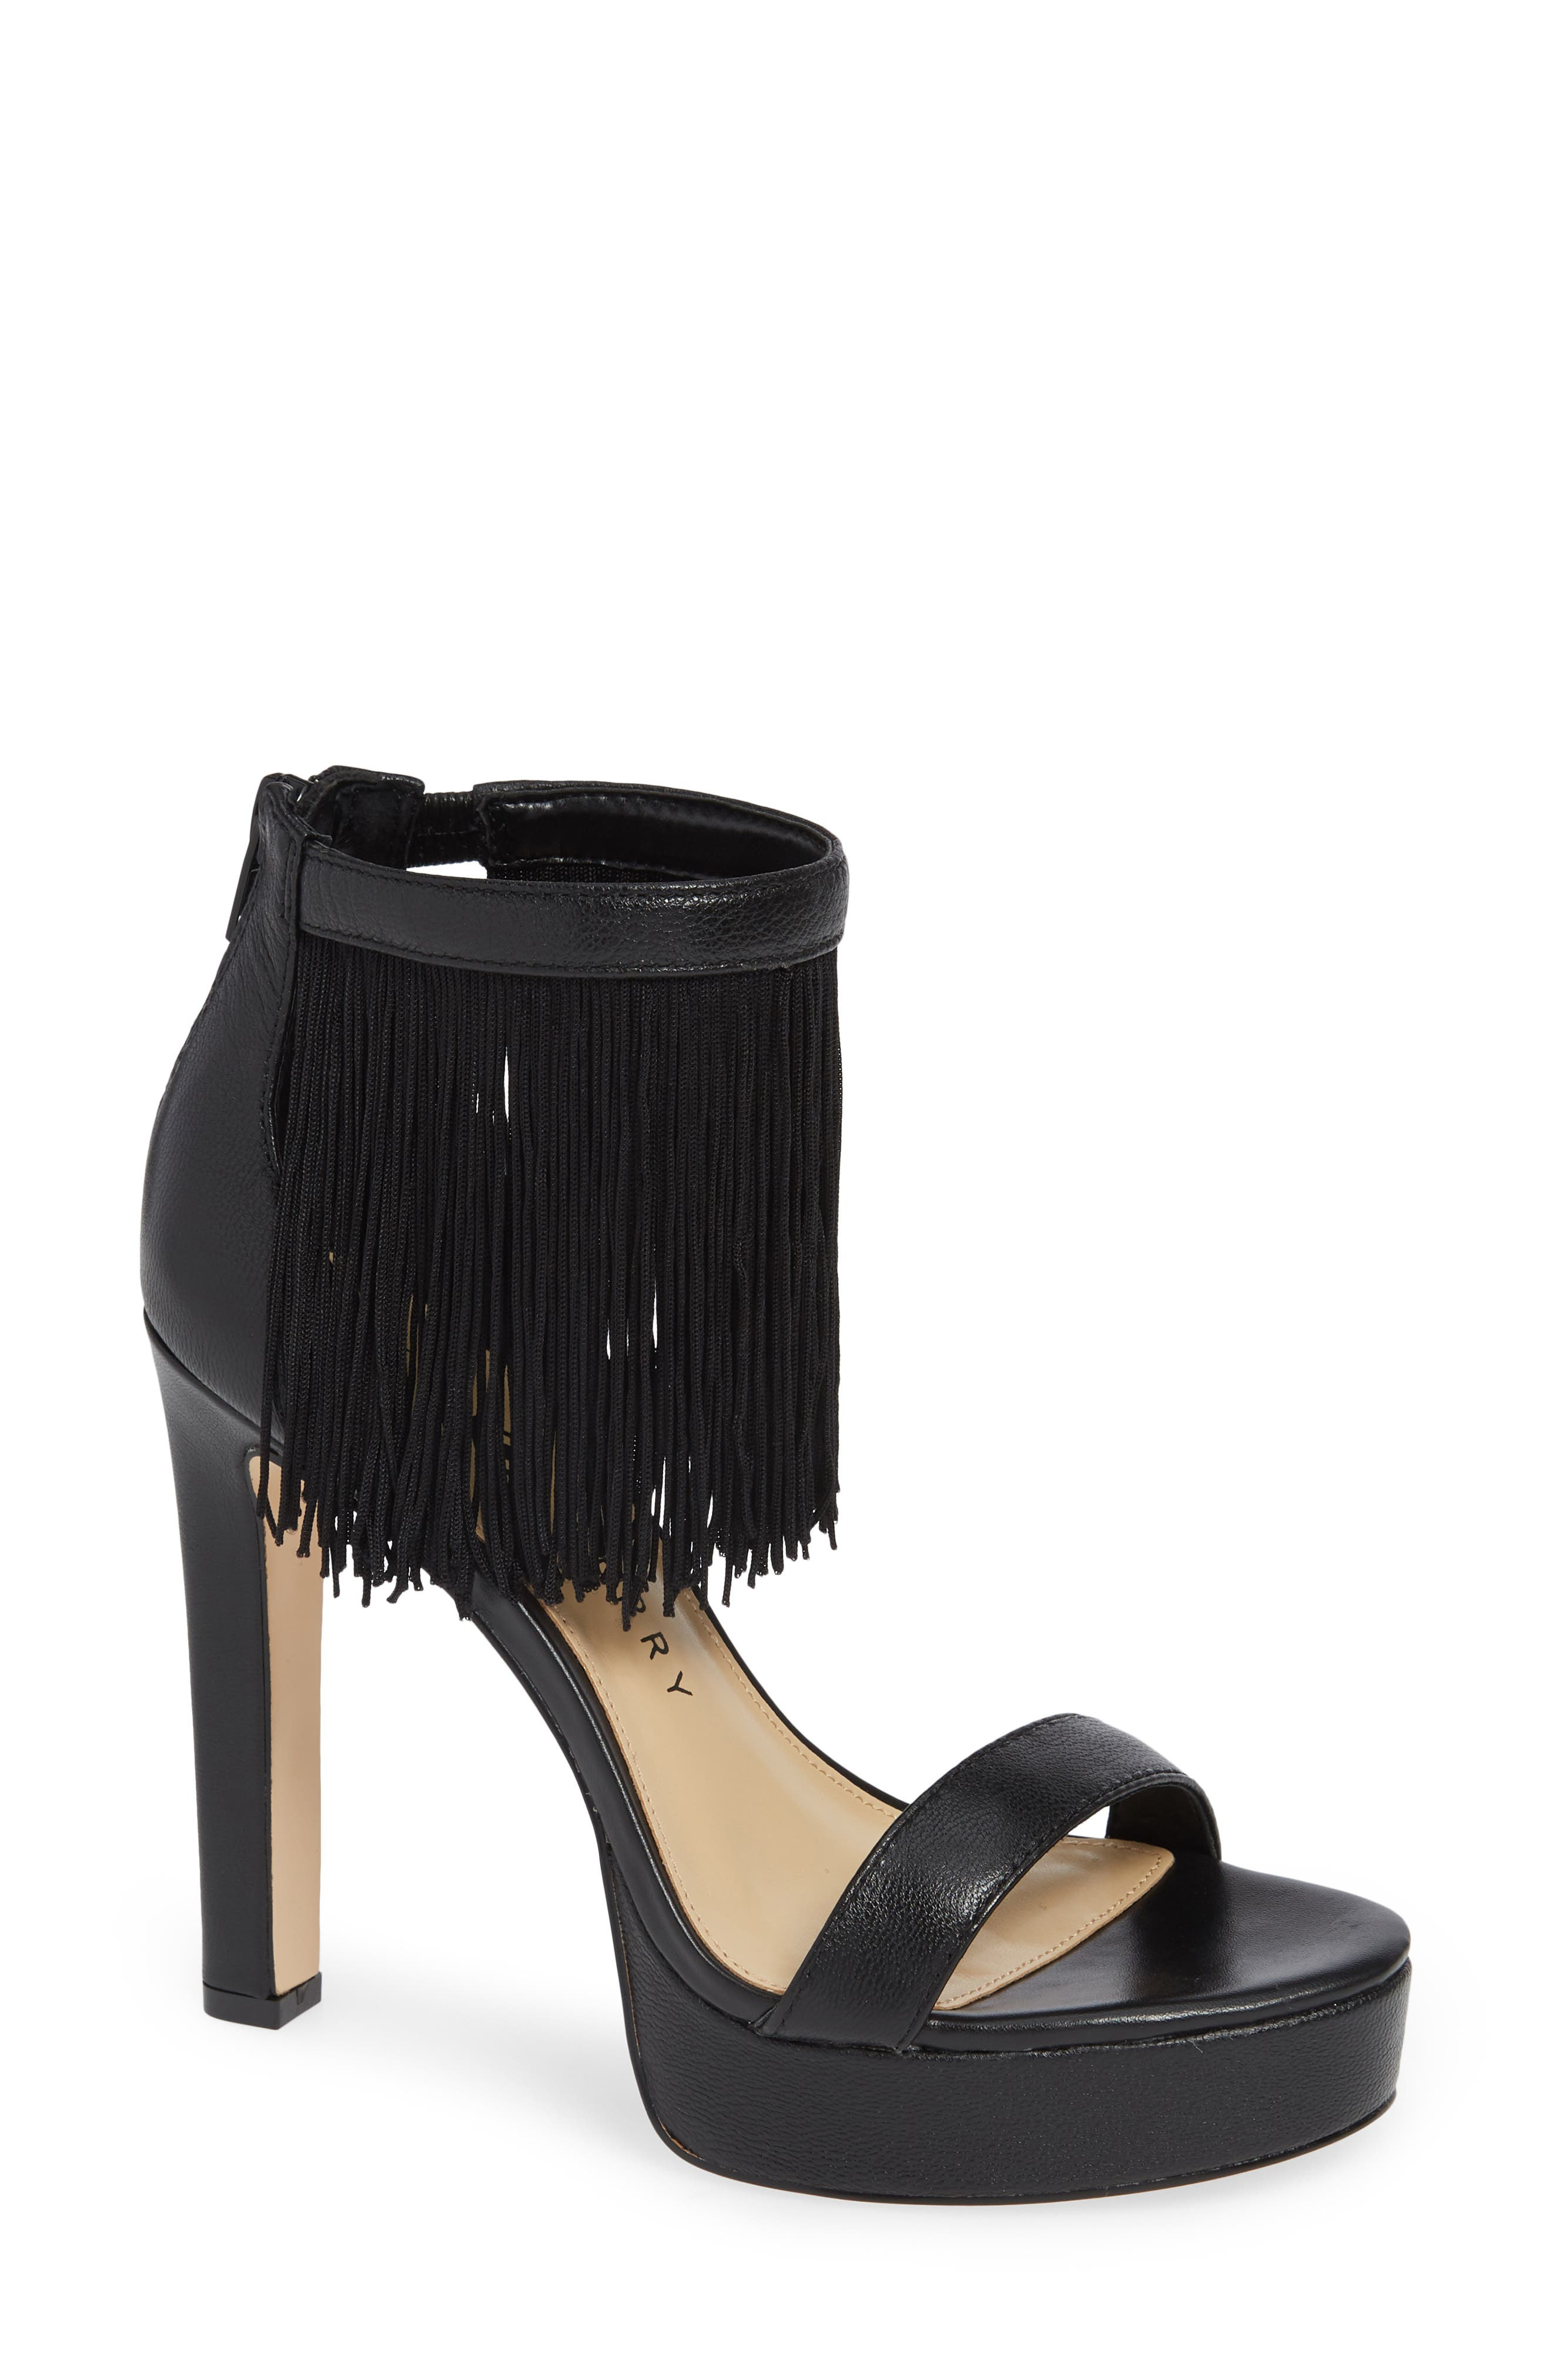 KATY PERRY Fringed Platform Sandal in Black